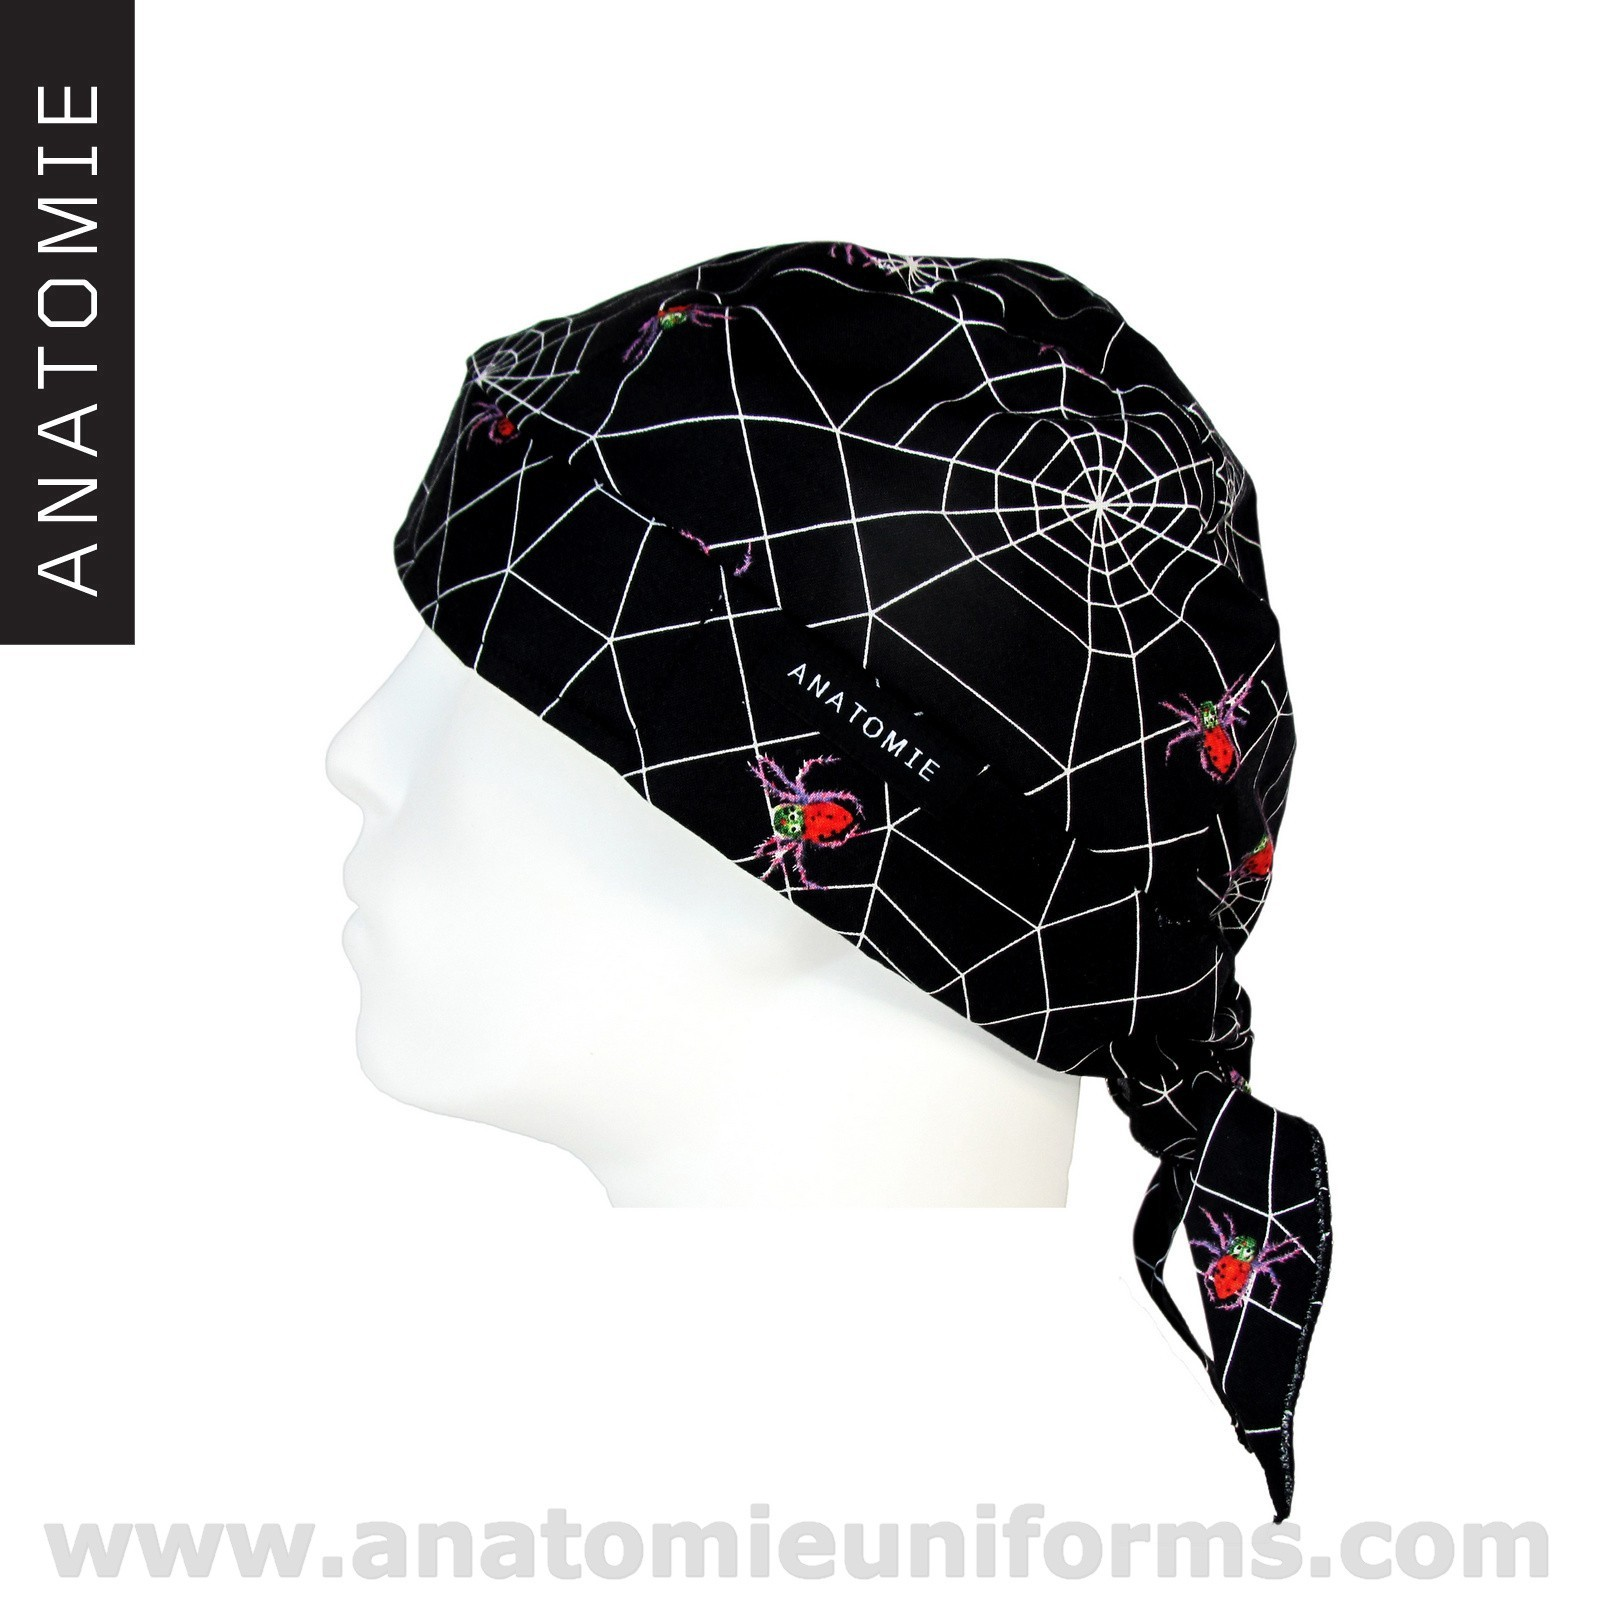 ANATOMIE BANDANA Médecins Spiders - 012